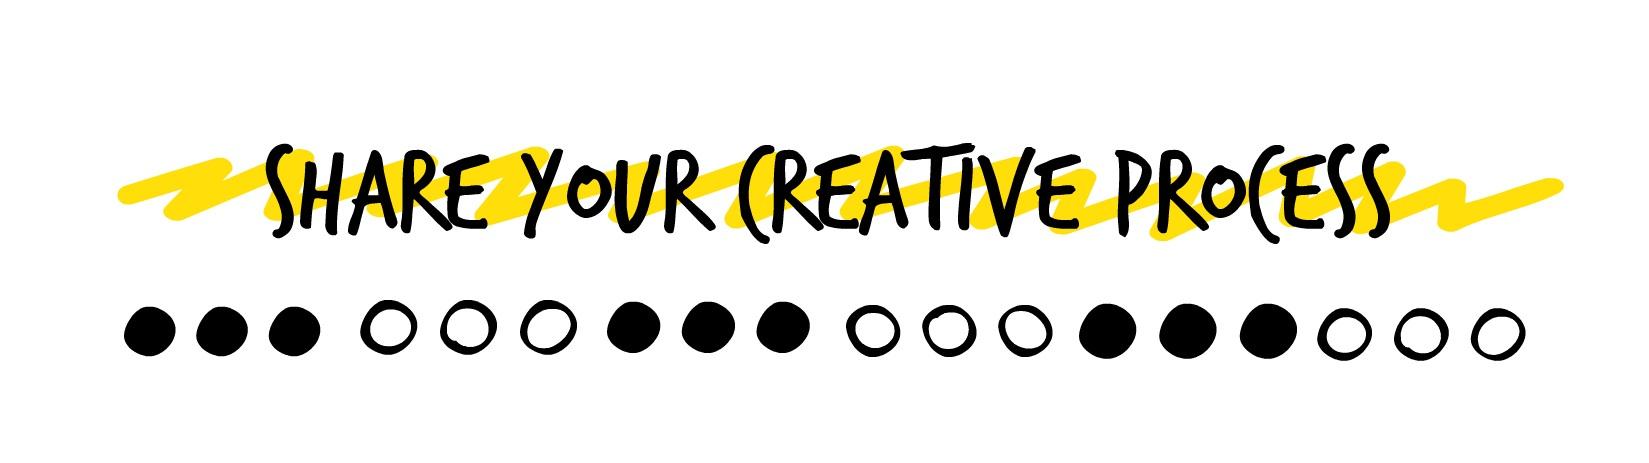 creative+process.jpg